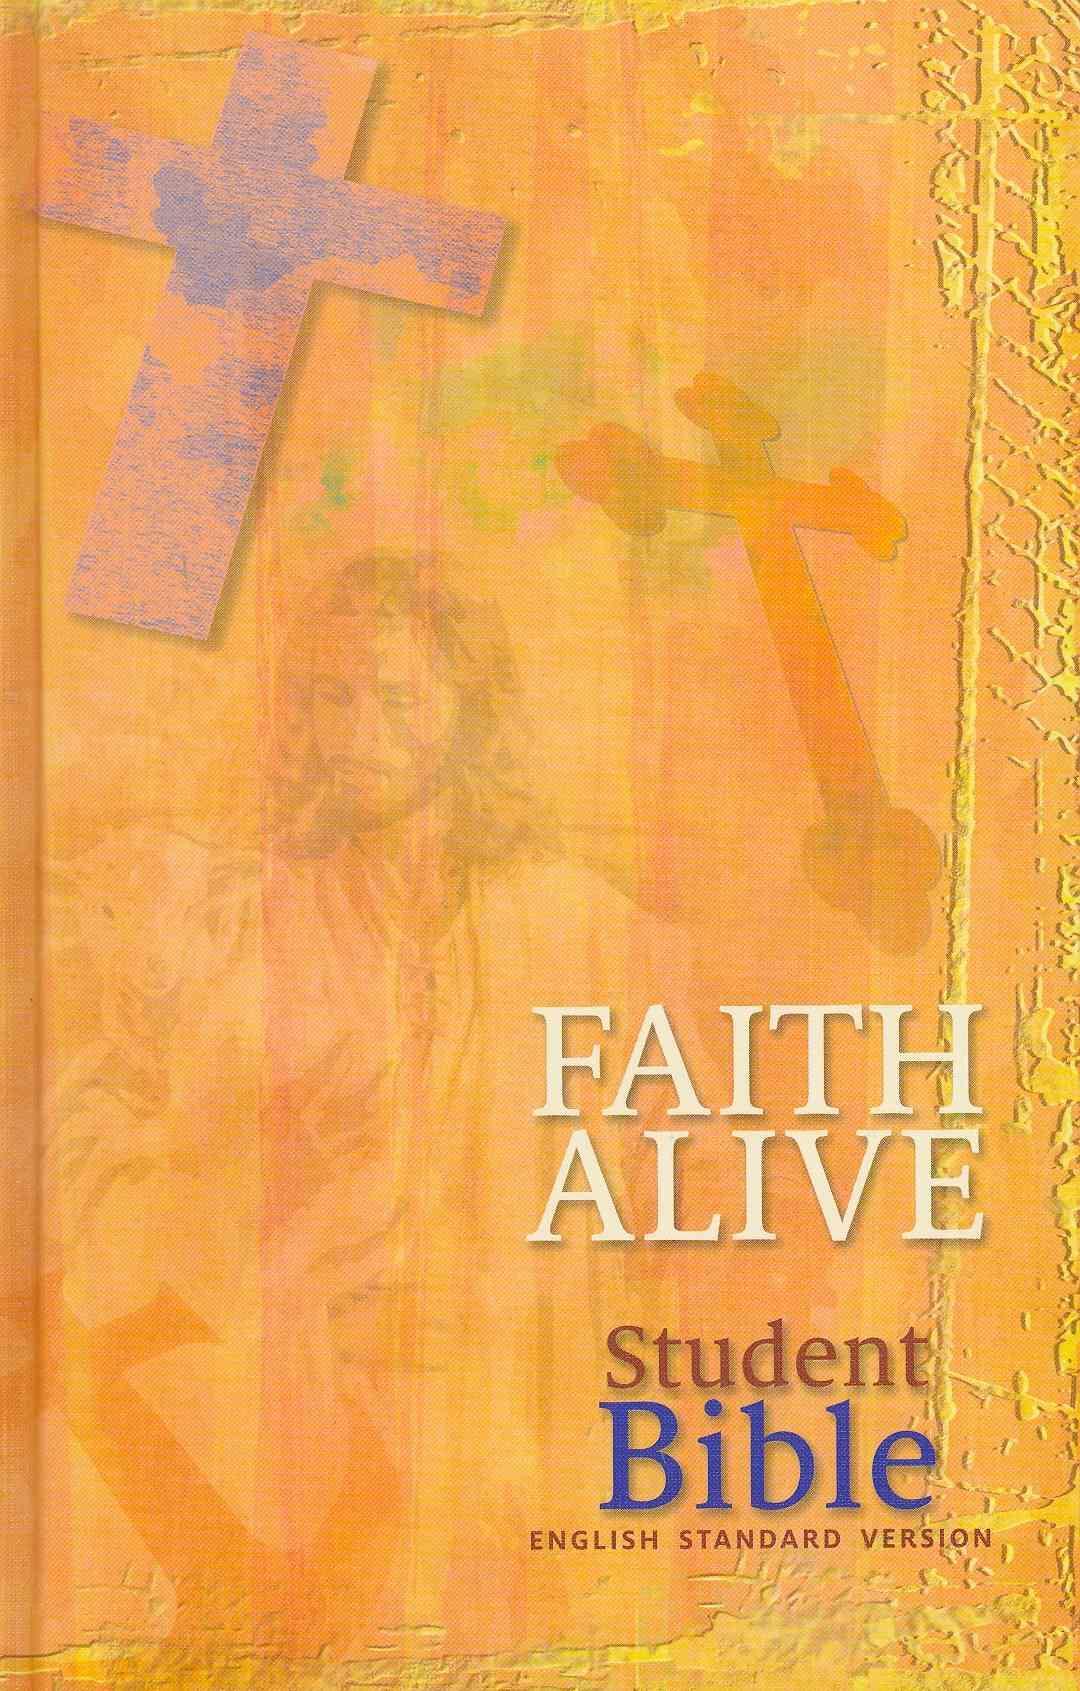 Faith Alive Bible: English Standard Version Translation (Hardcover)